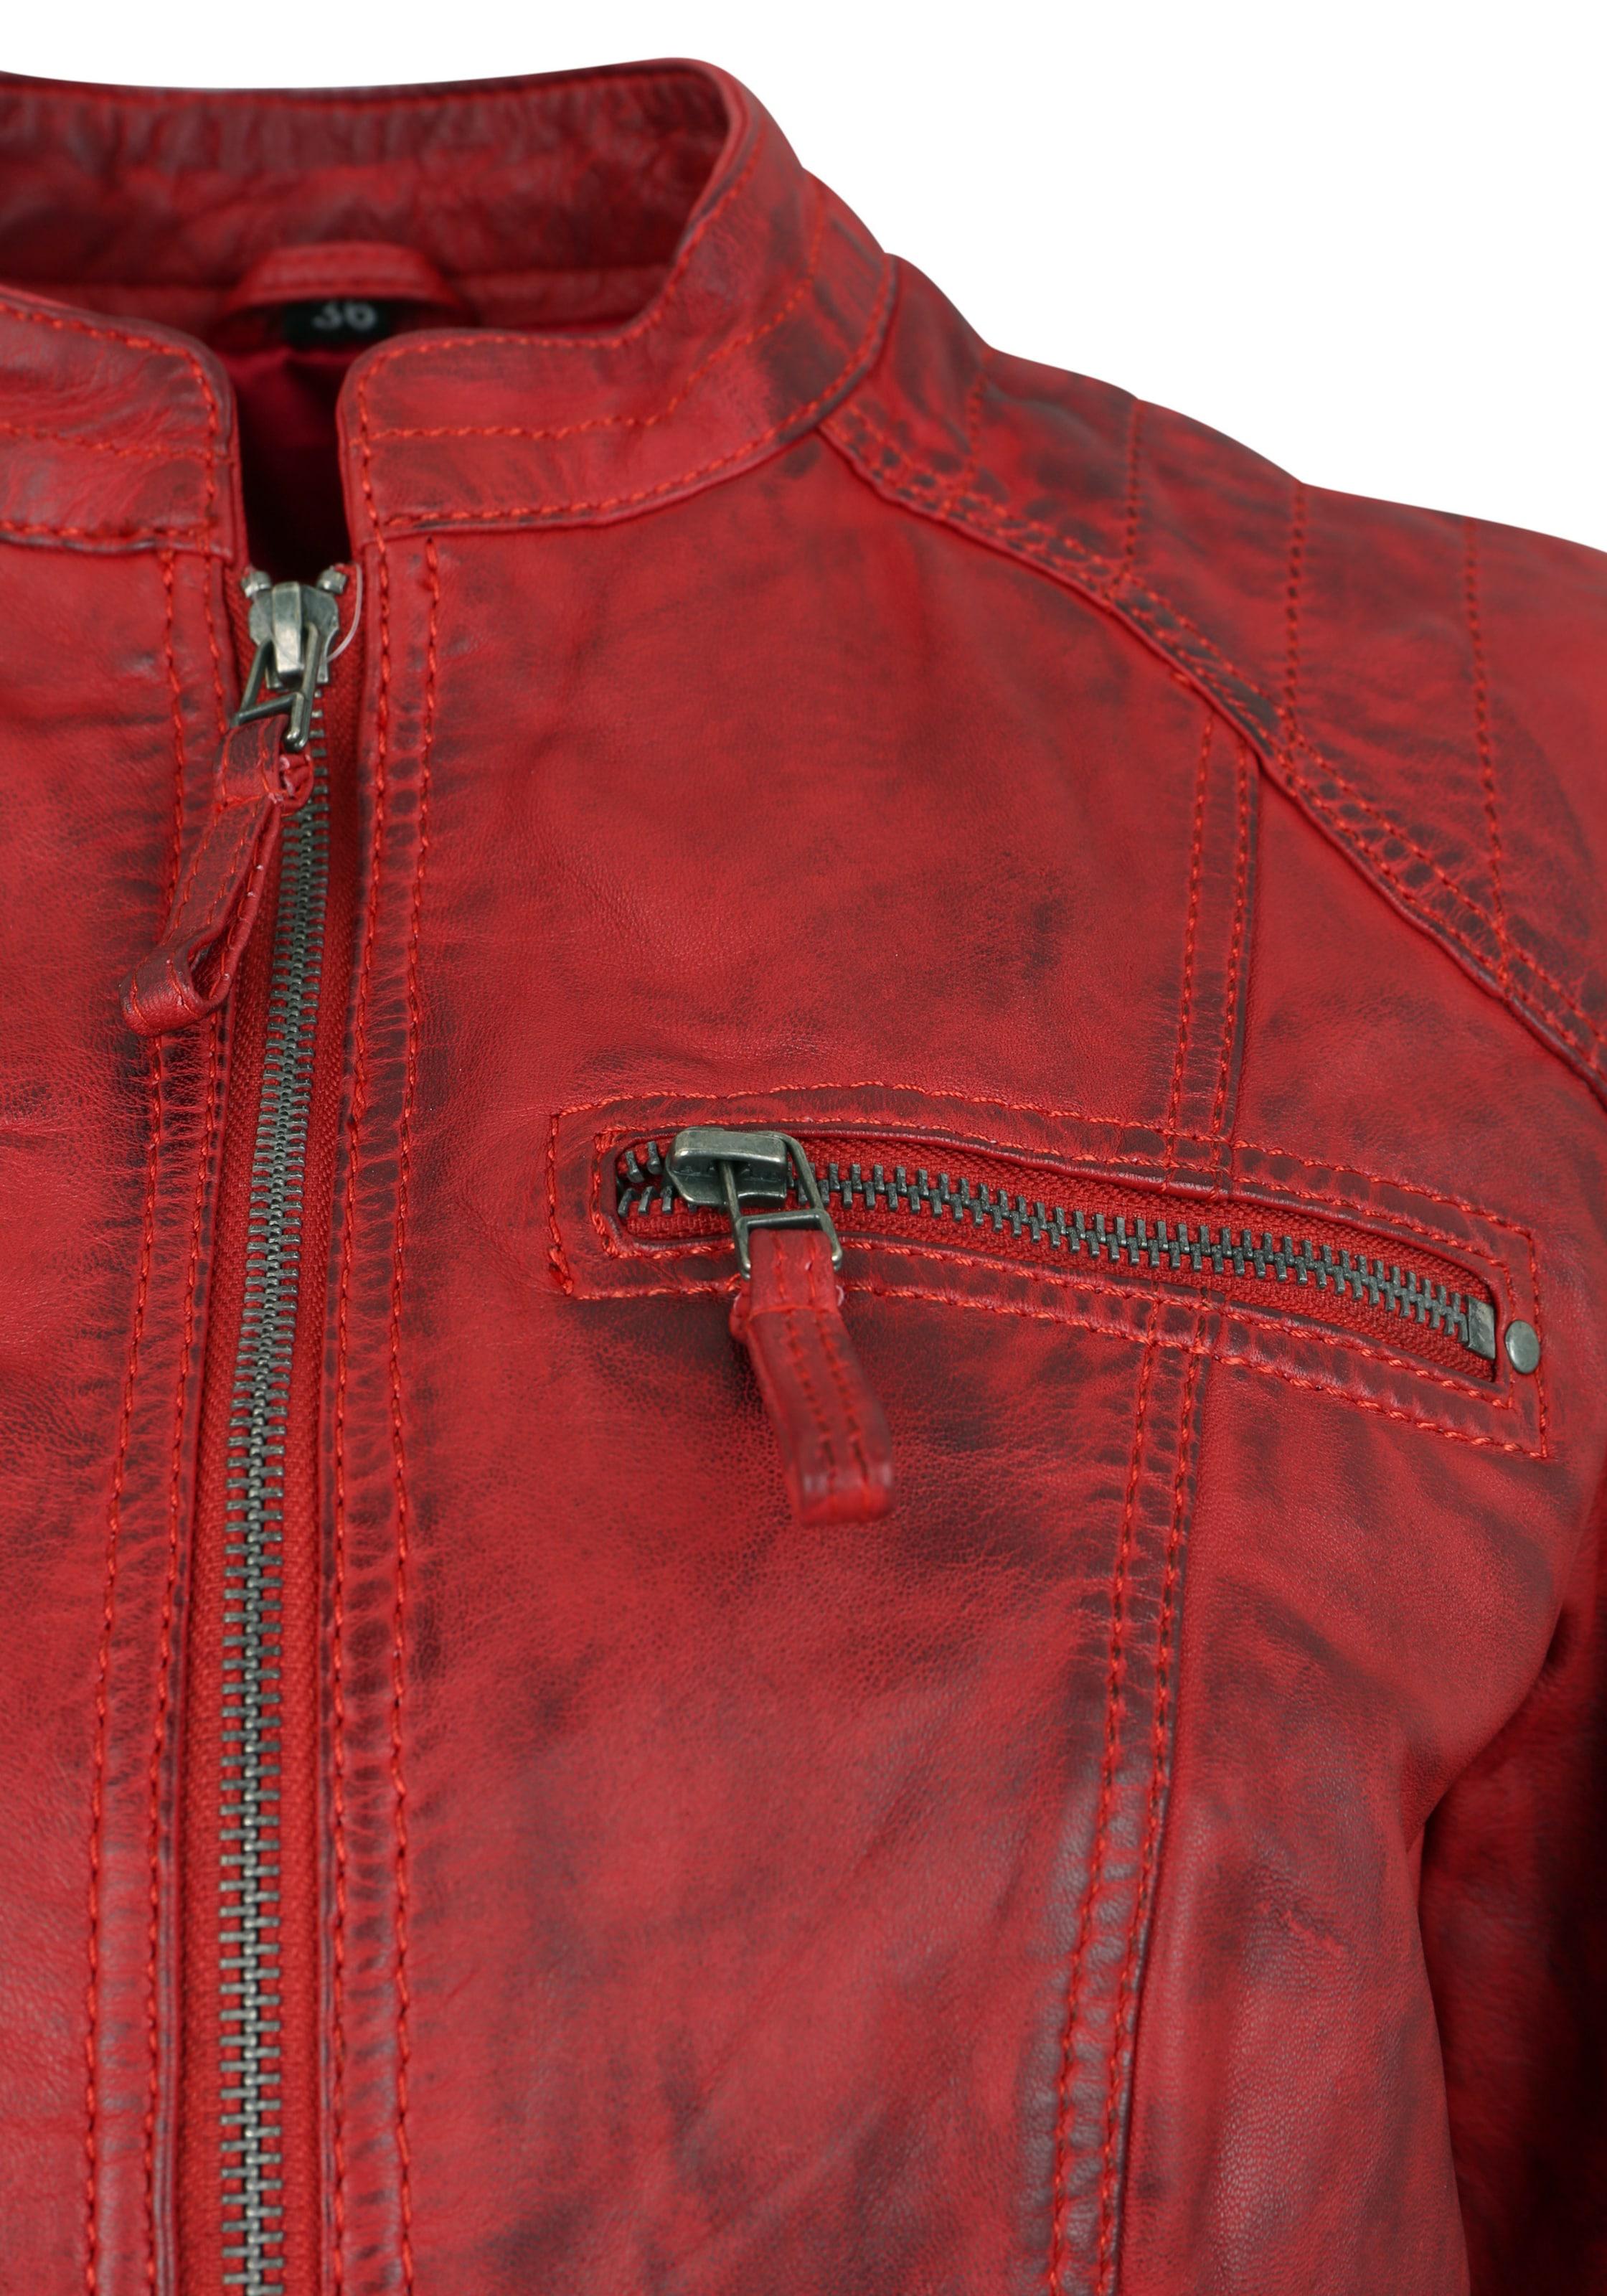 7eleven 'toulouse' 7eleven Lederjacke In In Rot 'toulouse' Rot Lederjacke WEeHIYD29